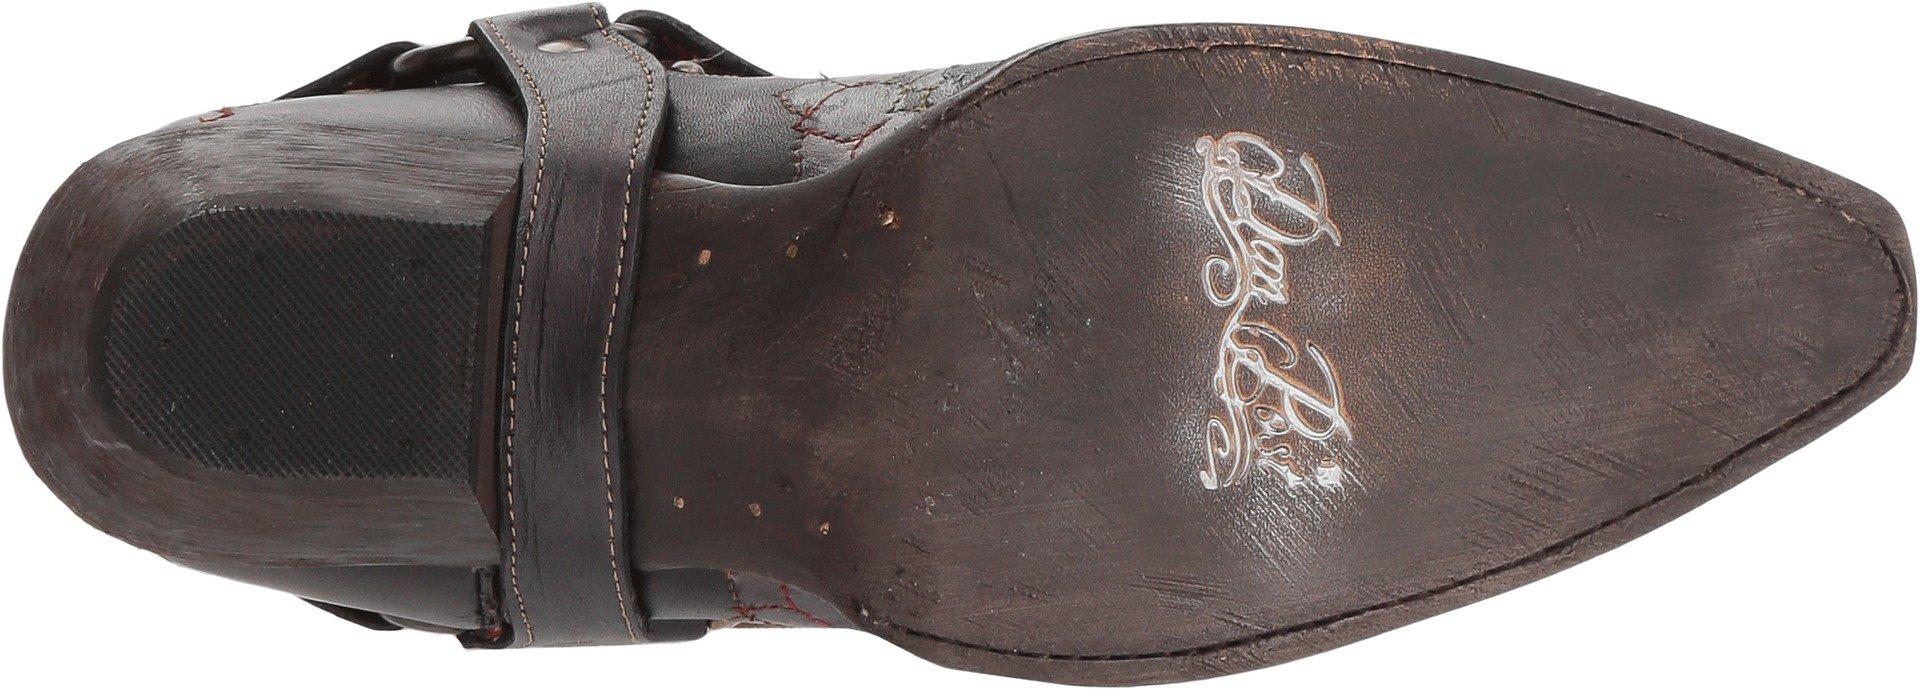 Dan Post Western Boots Womens Leslie 7.5 M Black Floral DP3545 by Dan Post Boot Company (Image #3)